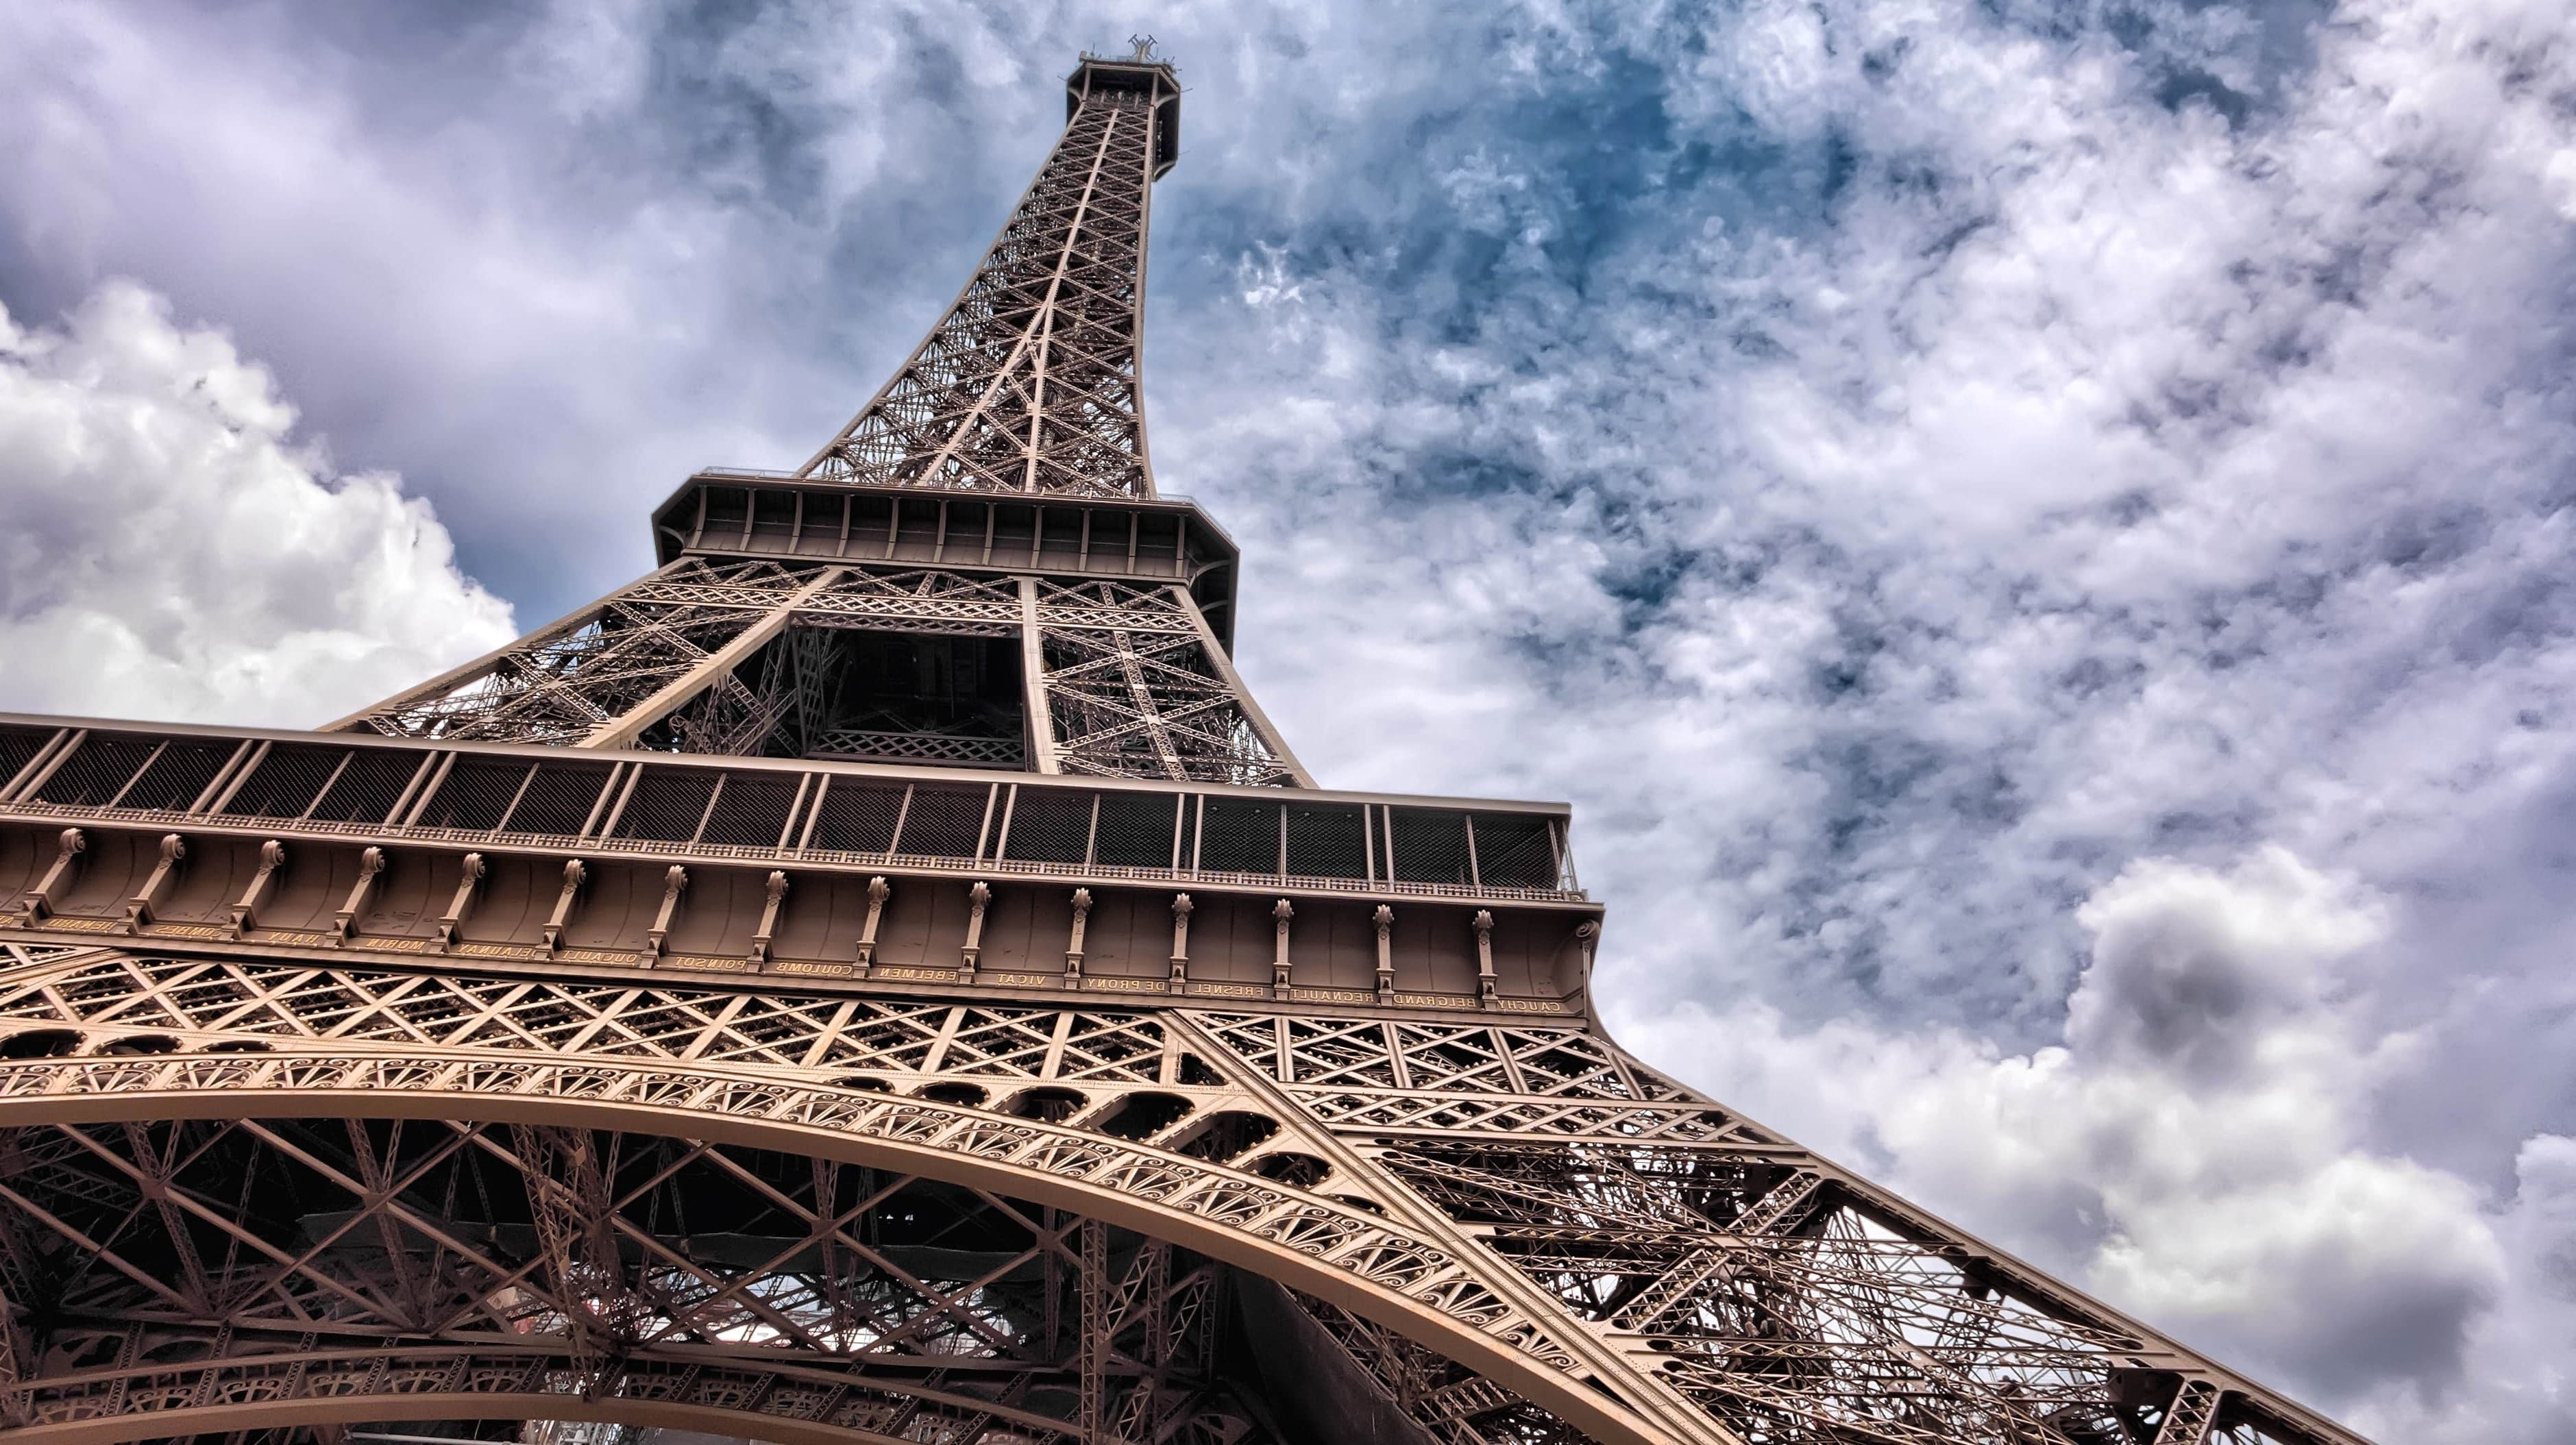 Hotel Paris Eiffel-Turm, Denkmal | 75015 Montparnasse